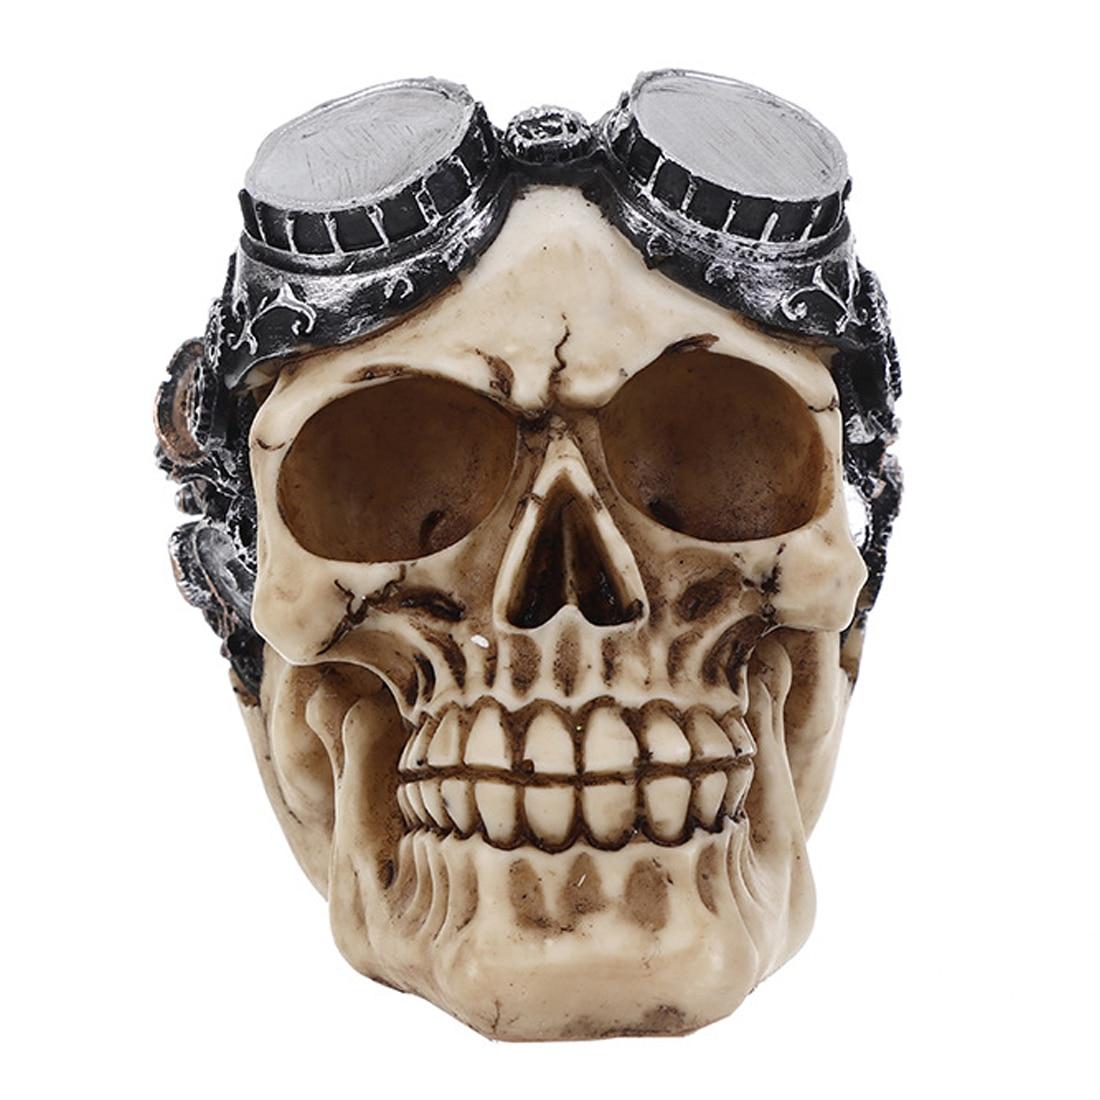 Aliexpress.com : Buy Halloween Decoration Resin Crafts